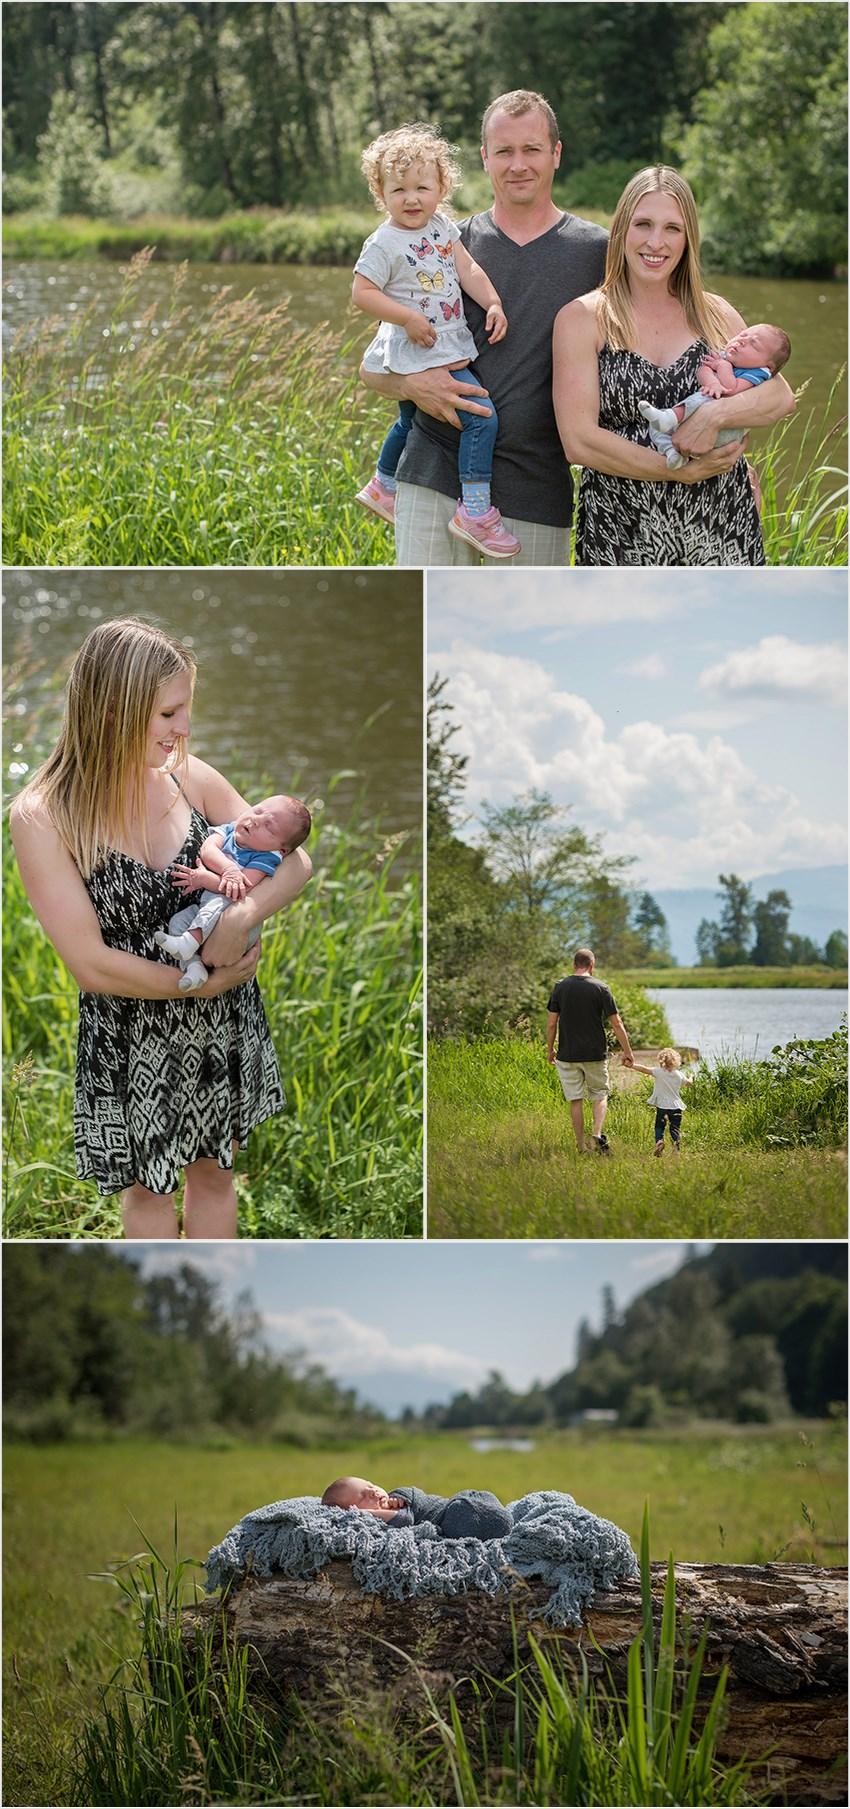 Baby Derrick Abbotsford Outdoor Newborn Photographer 002 (Side 2)